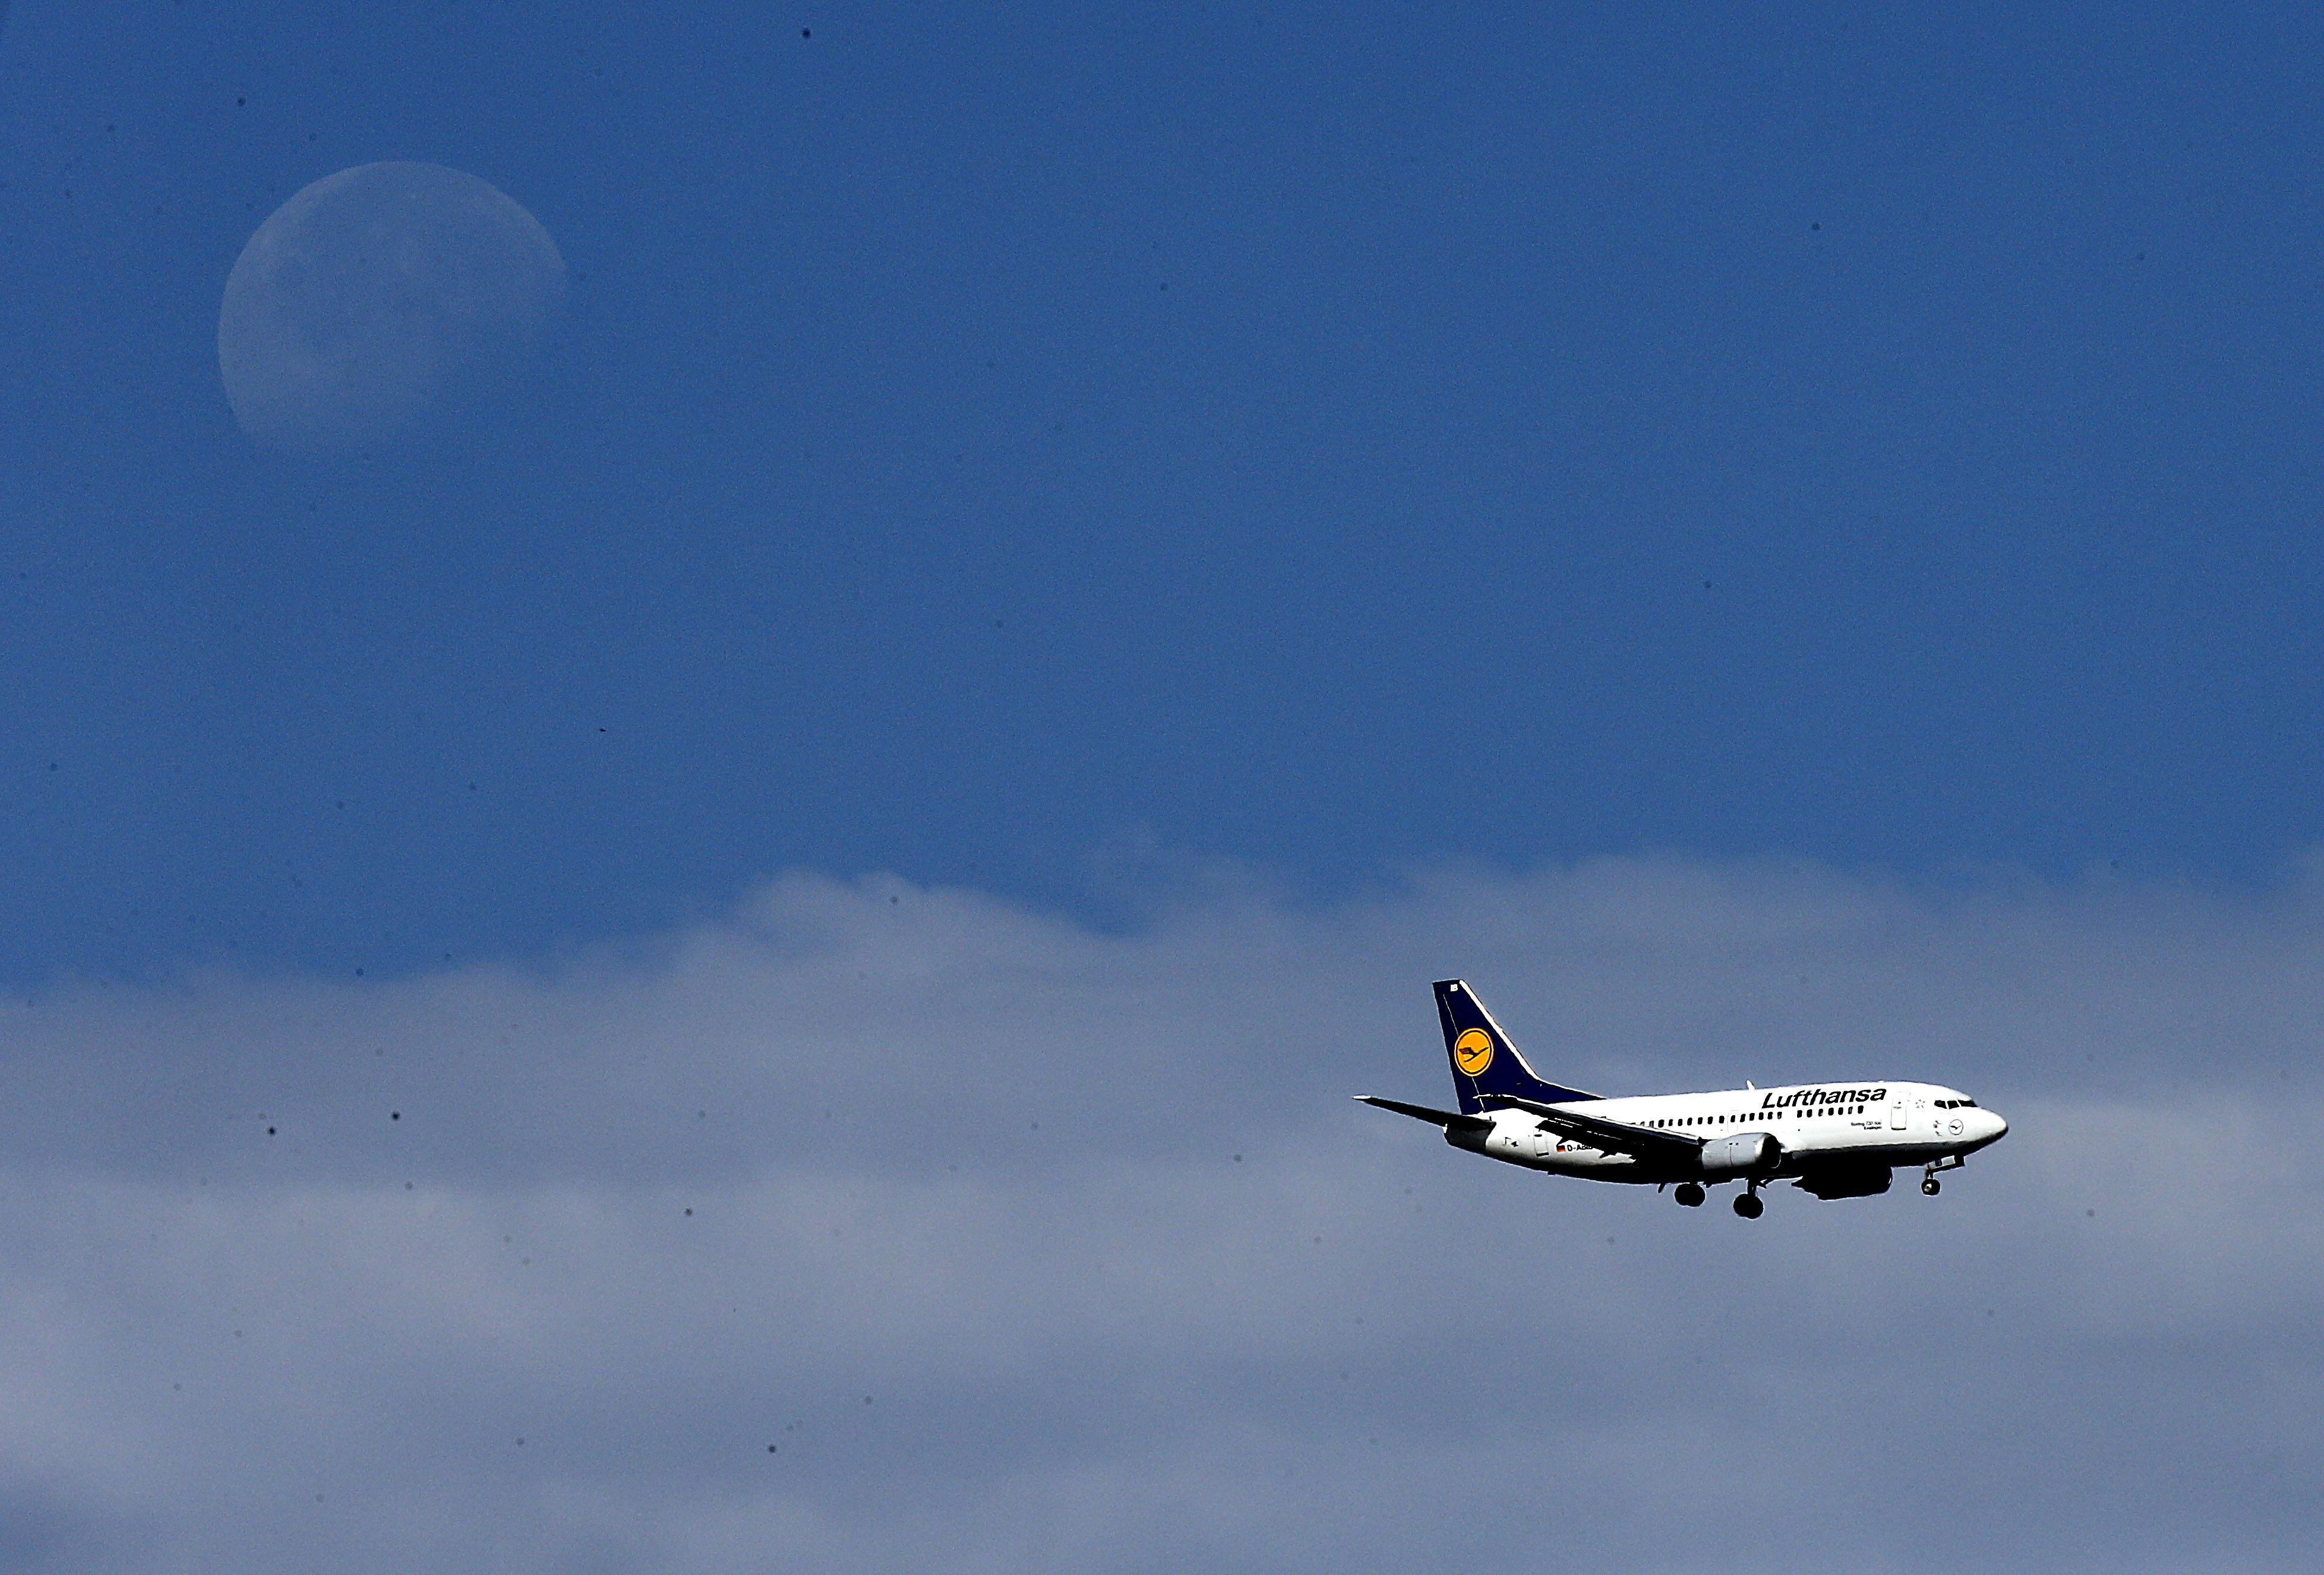 <p>A Lufhansa passenger plane approaches landing. (AP Photo/Frank Augstein)</p>